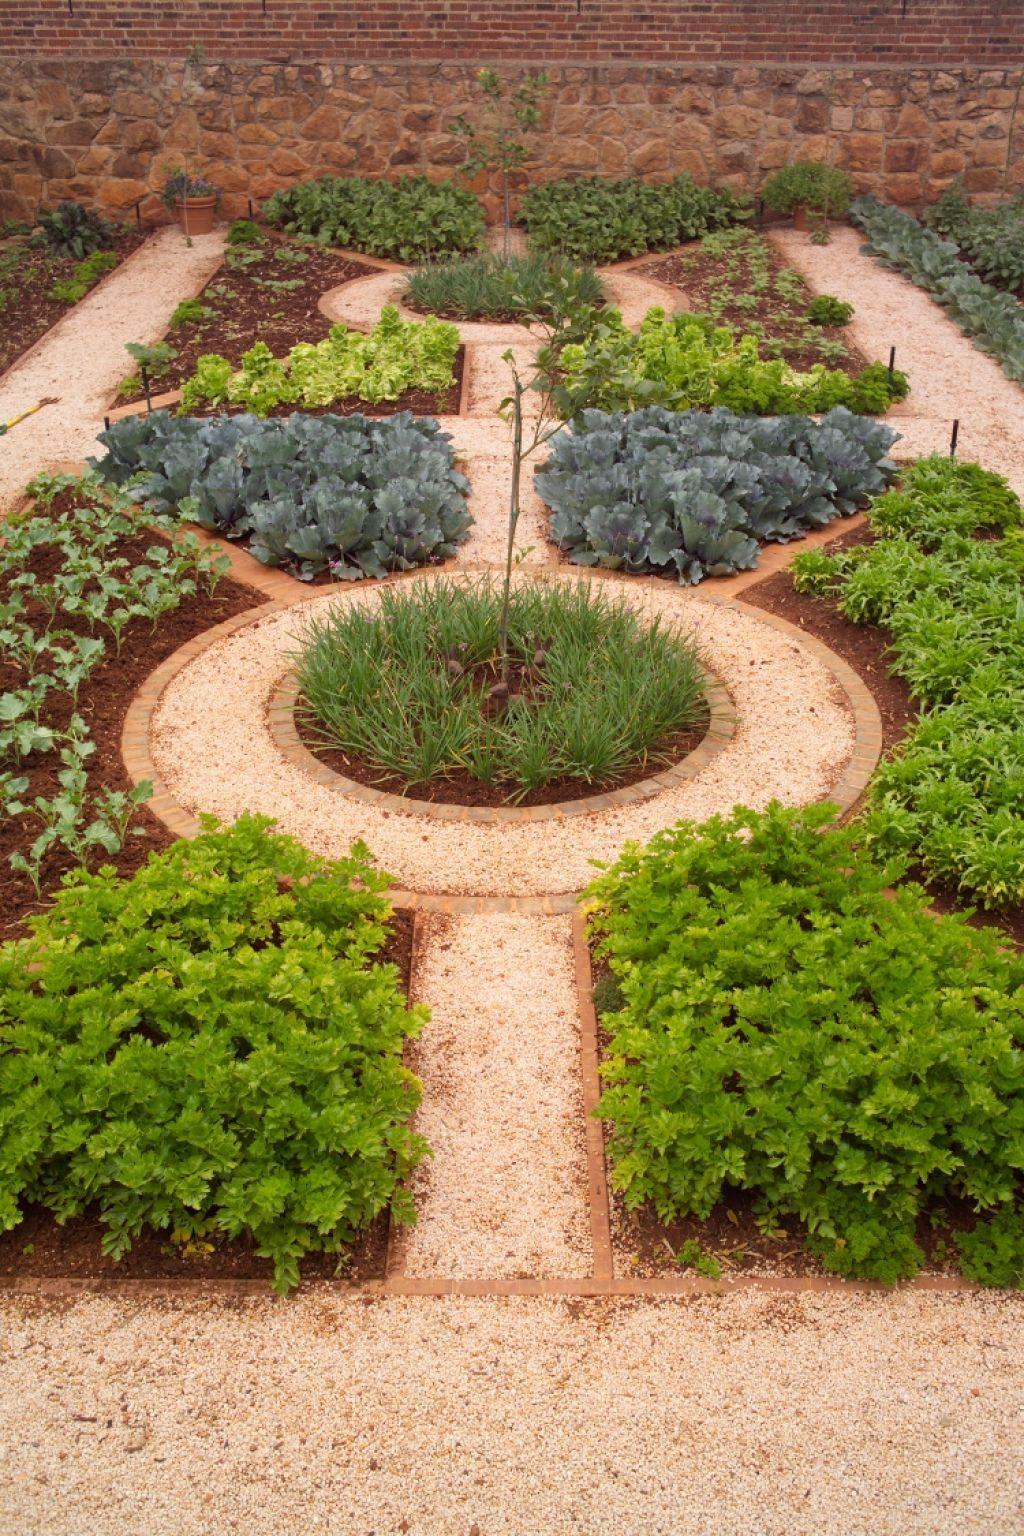 Vegetable garden with covered walkways - Explore Vegetable Garden Design And More